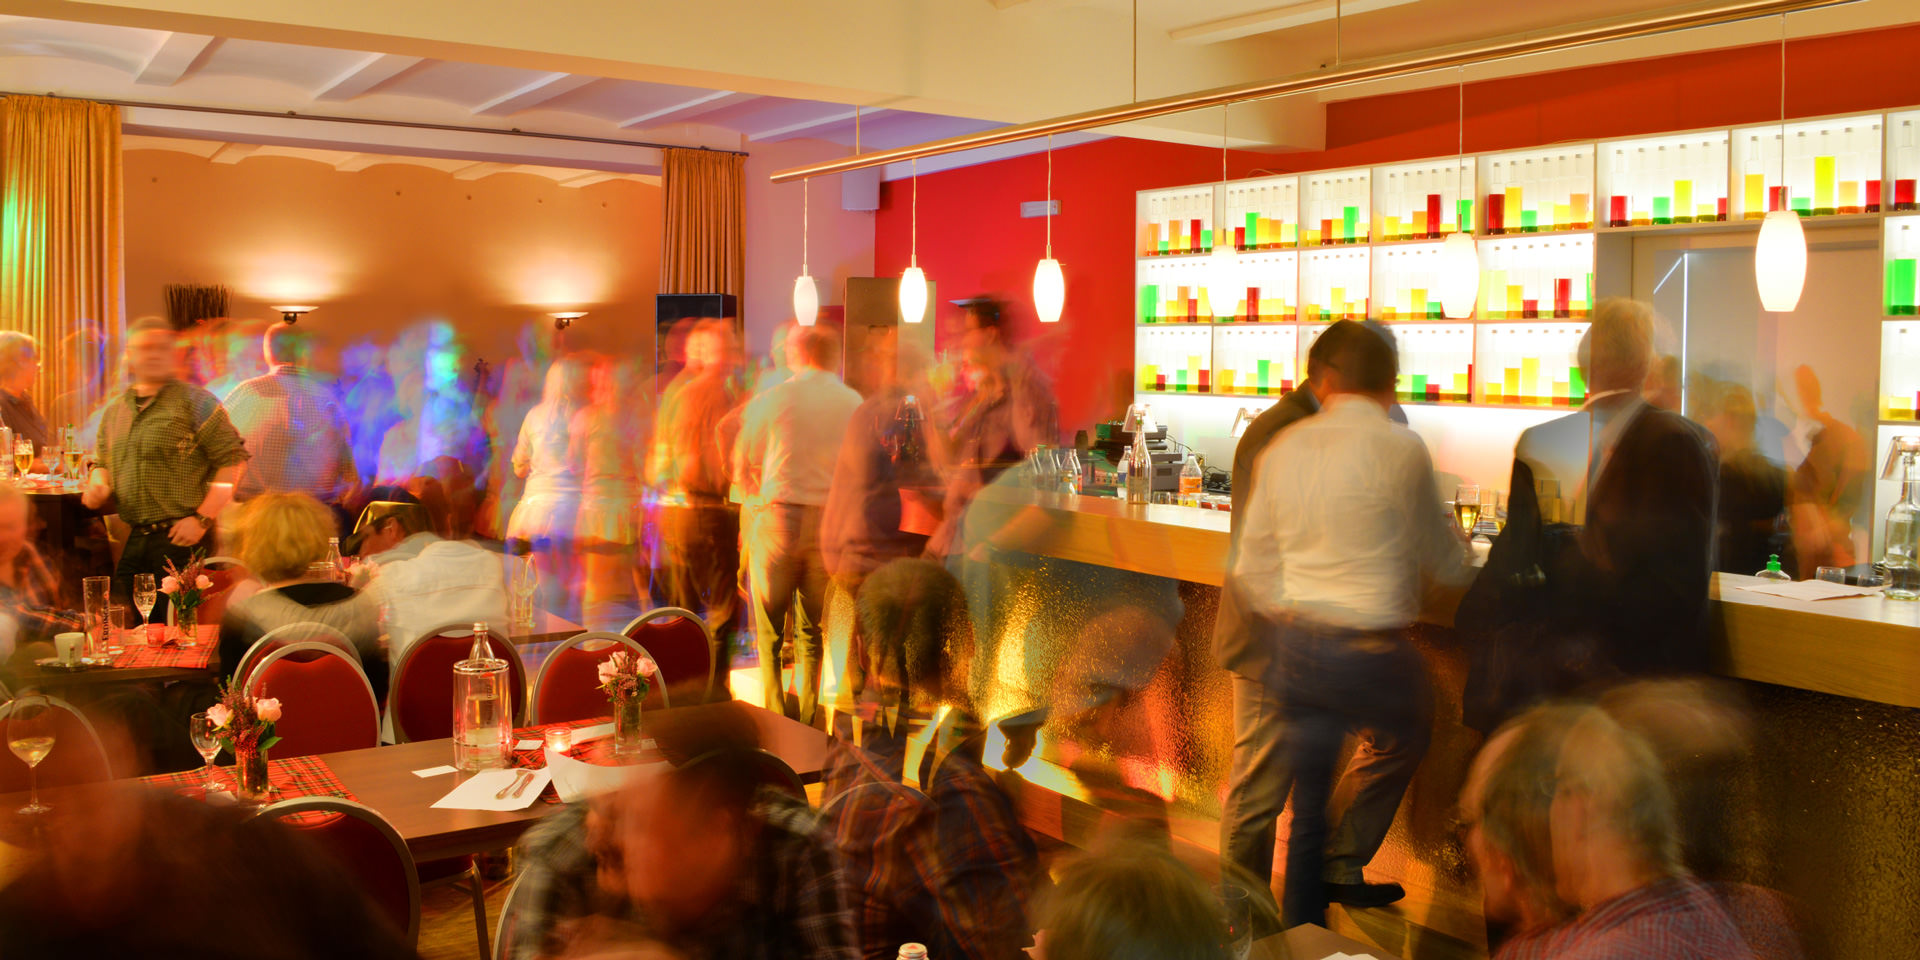 SBI_Partysaal_1920x960px-3